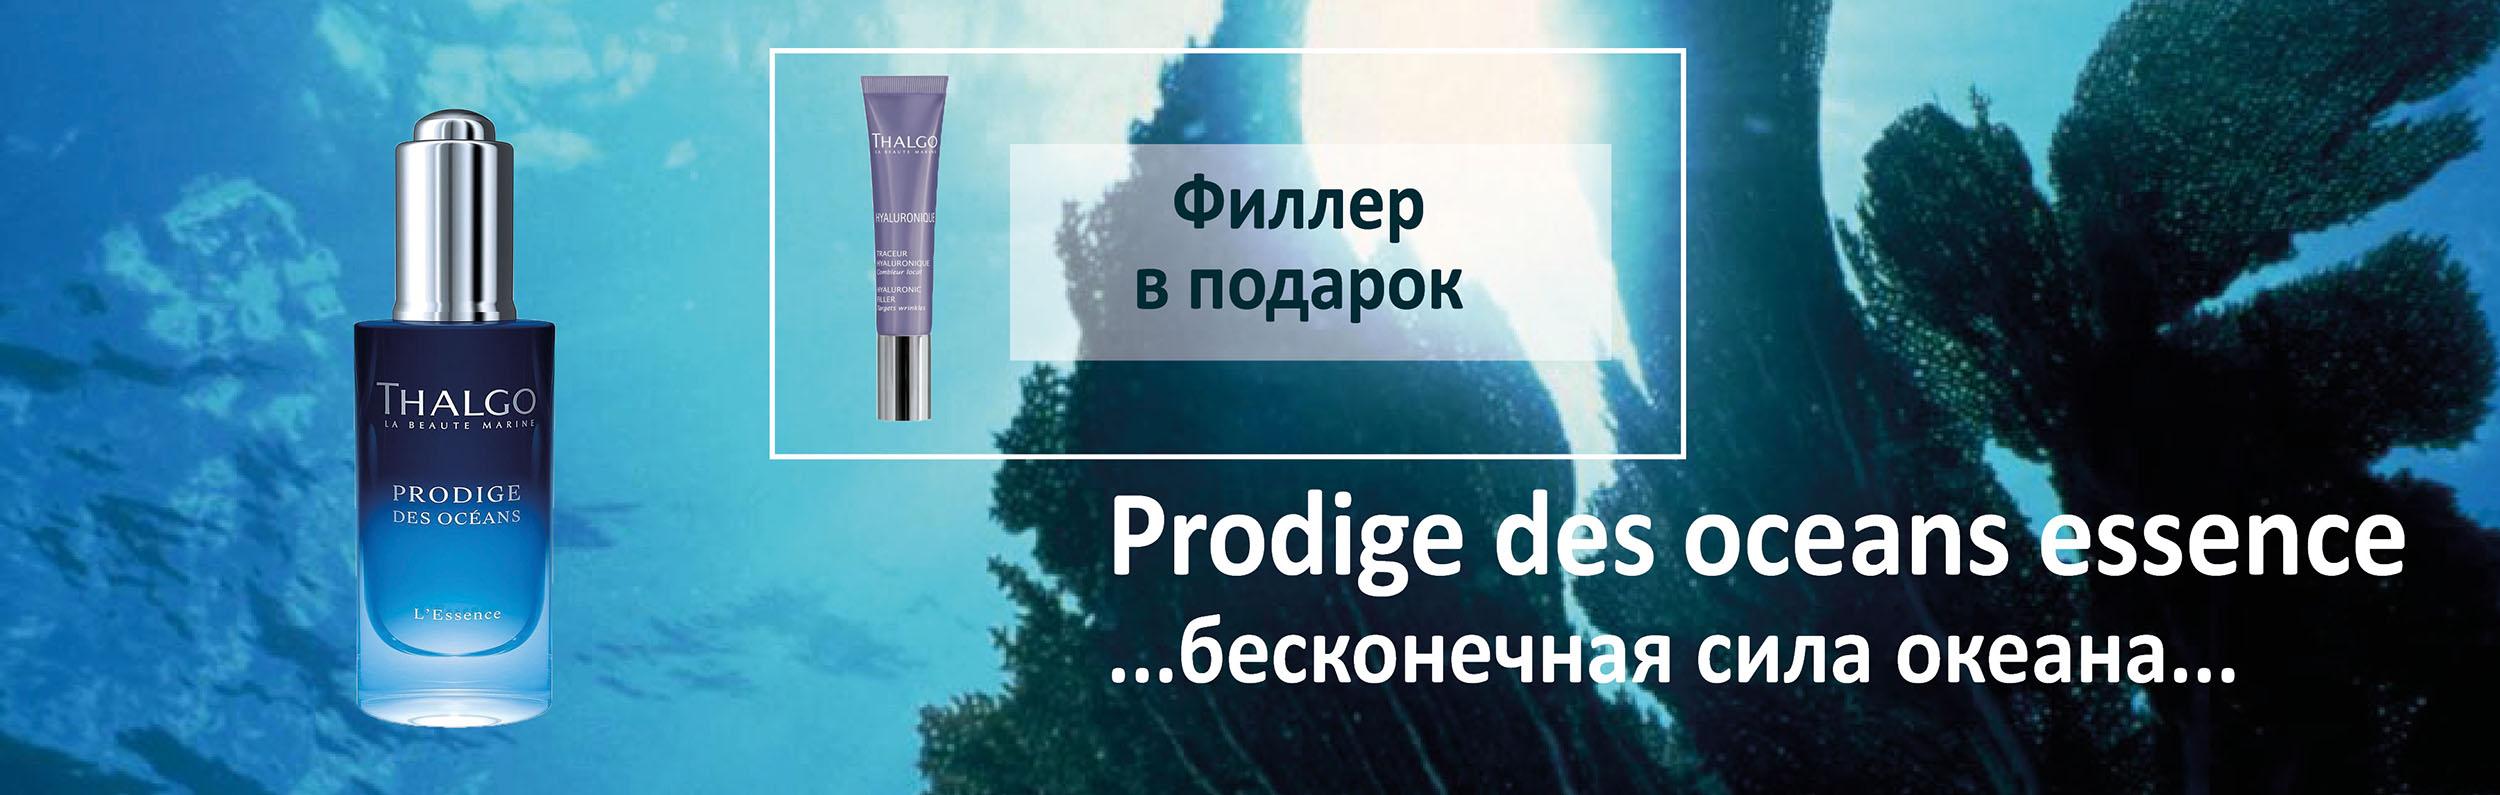 Prodige_des_oceans_essence_подарок.jpg